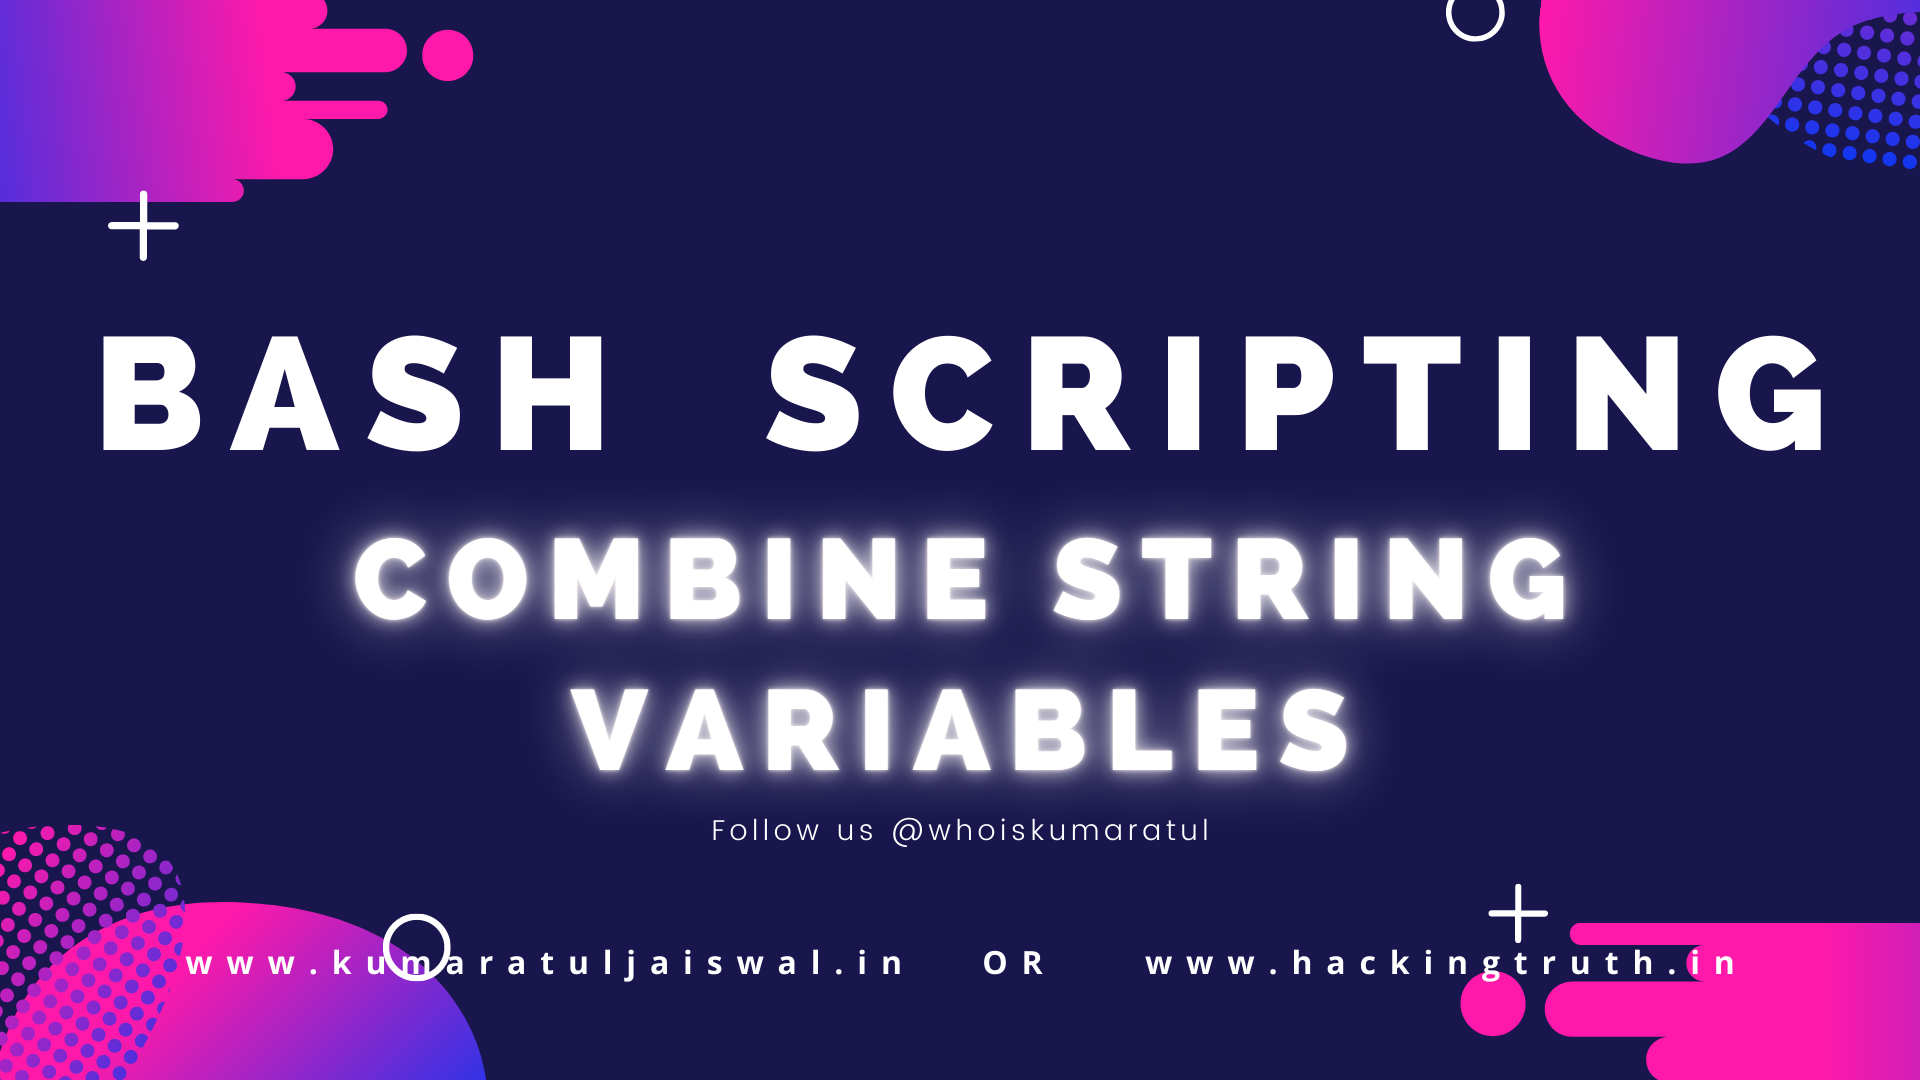 Bash Scripting Get Arguments from Command Line